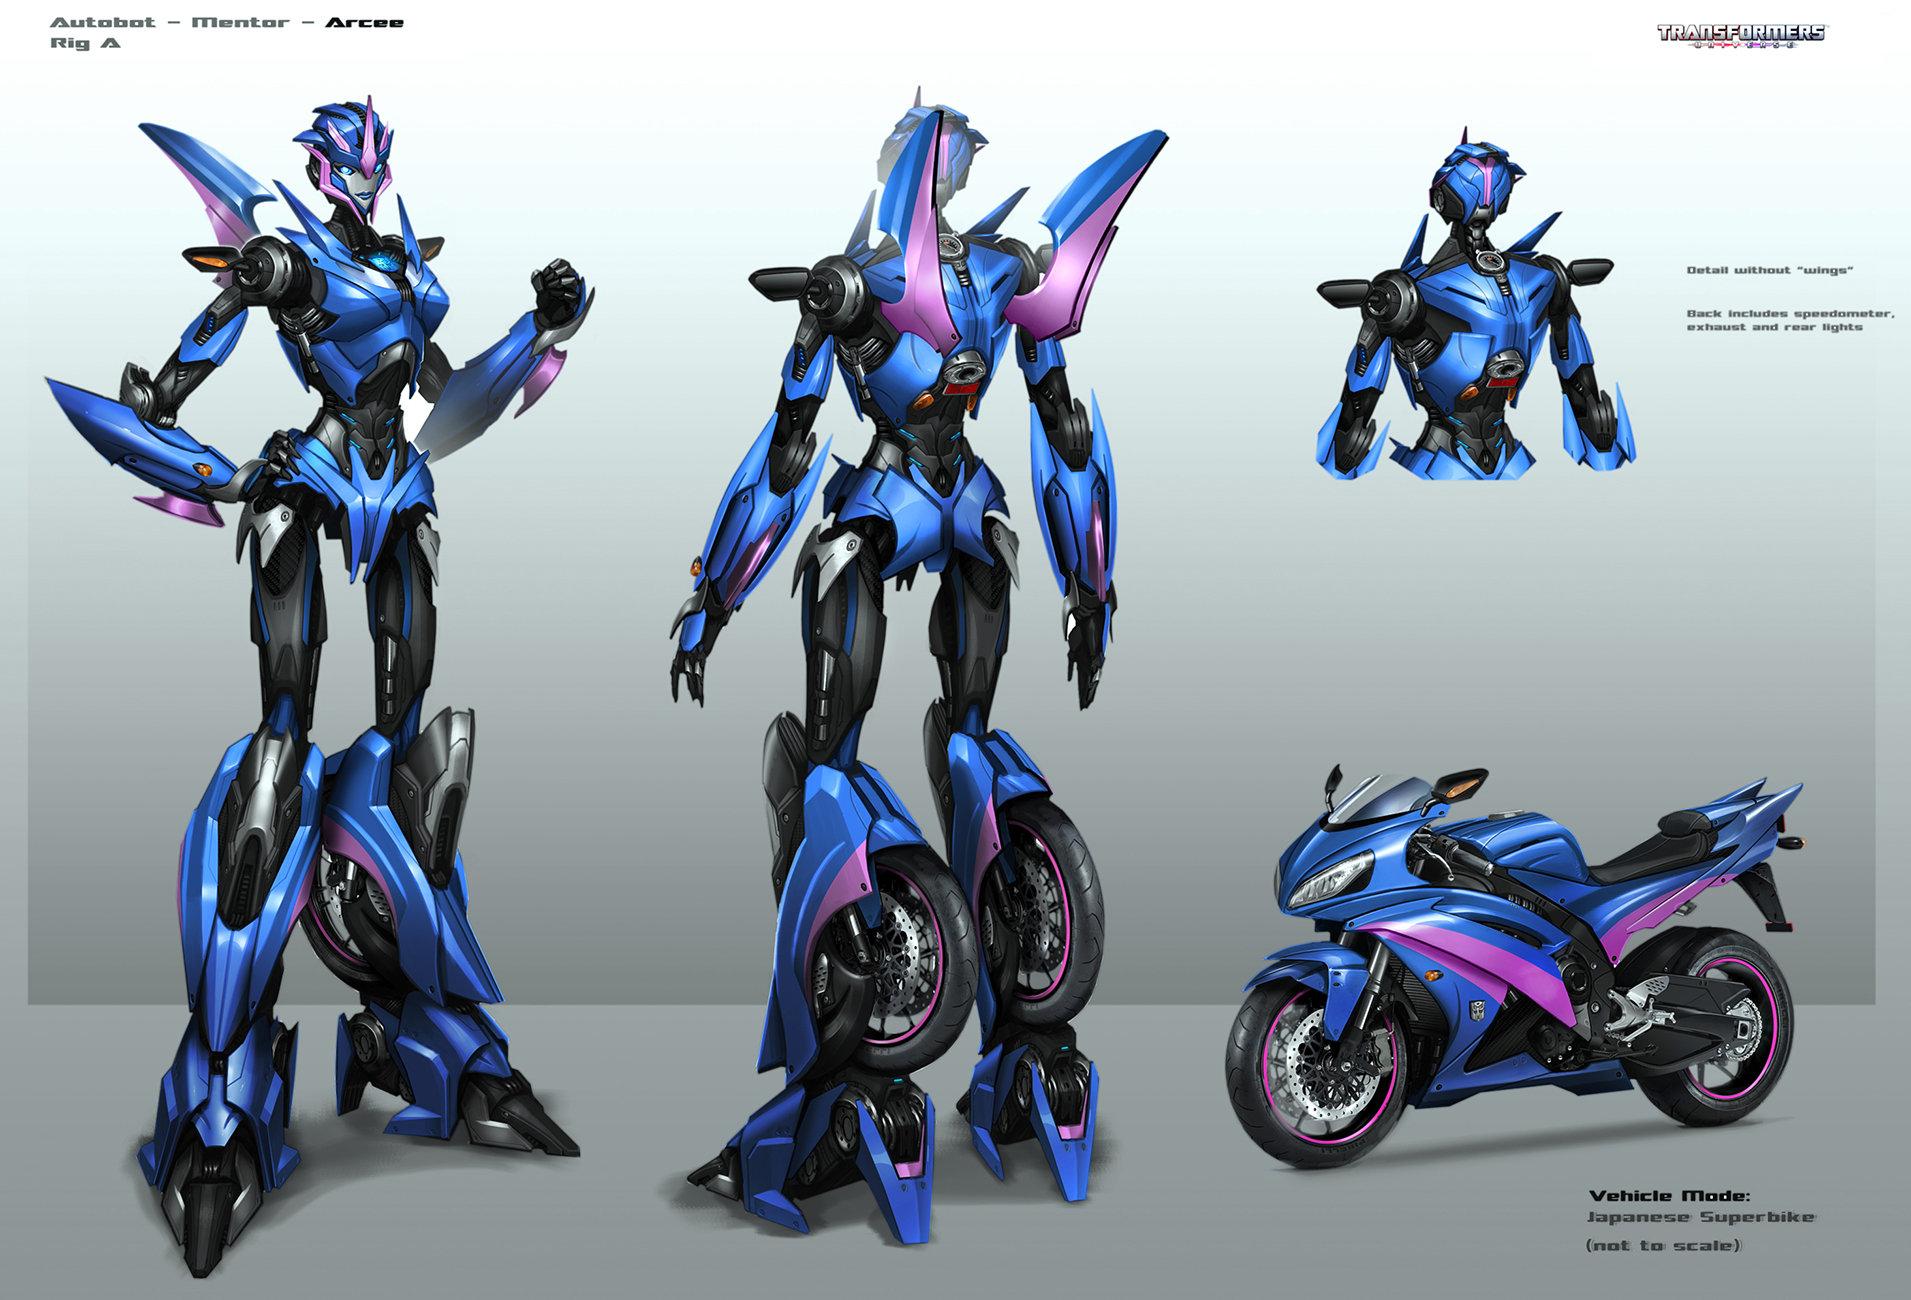 rc ebay with Transformers Universe Concept Art By Tom Stockwell 181818 on 291412251212 in addition New Toy Kingdom Logo likewise Uebersicht Von Stecker Buchsen Im Modellbau also 162263543115 in addition 281732276958.